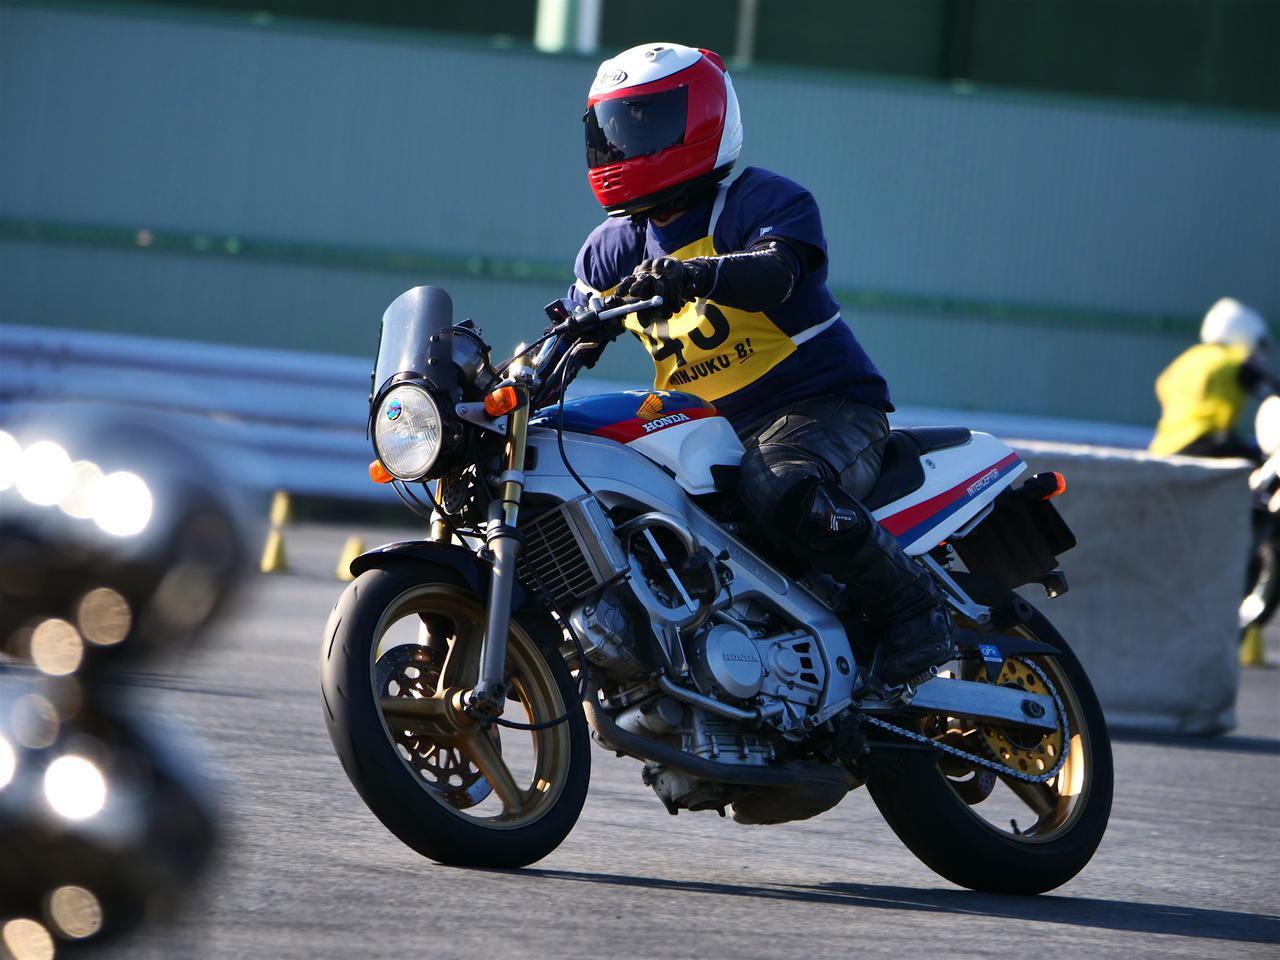 Images : 7番目の画像 - 2019ダンロップ・オートバイ杯ジムカーナ第5戦 - webオートバイ